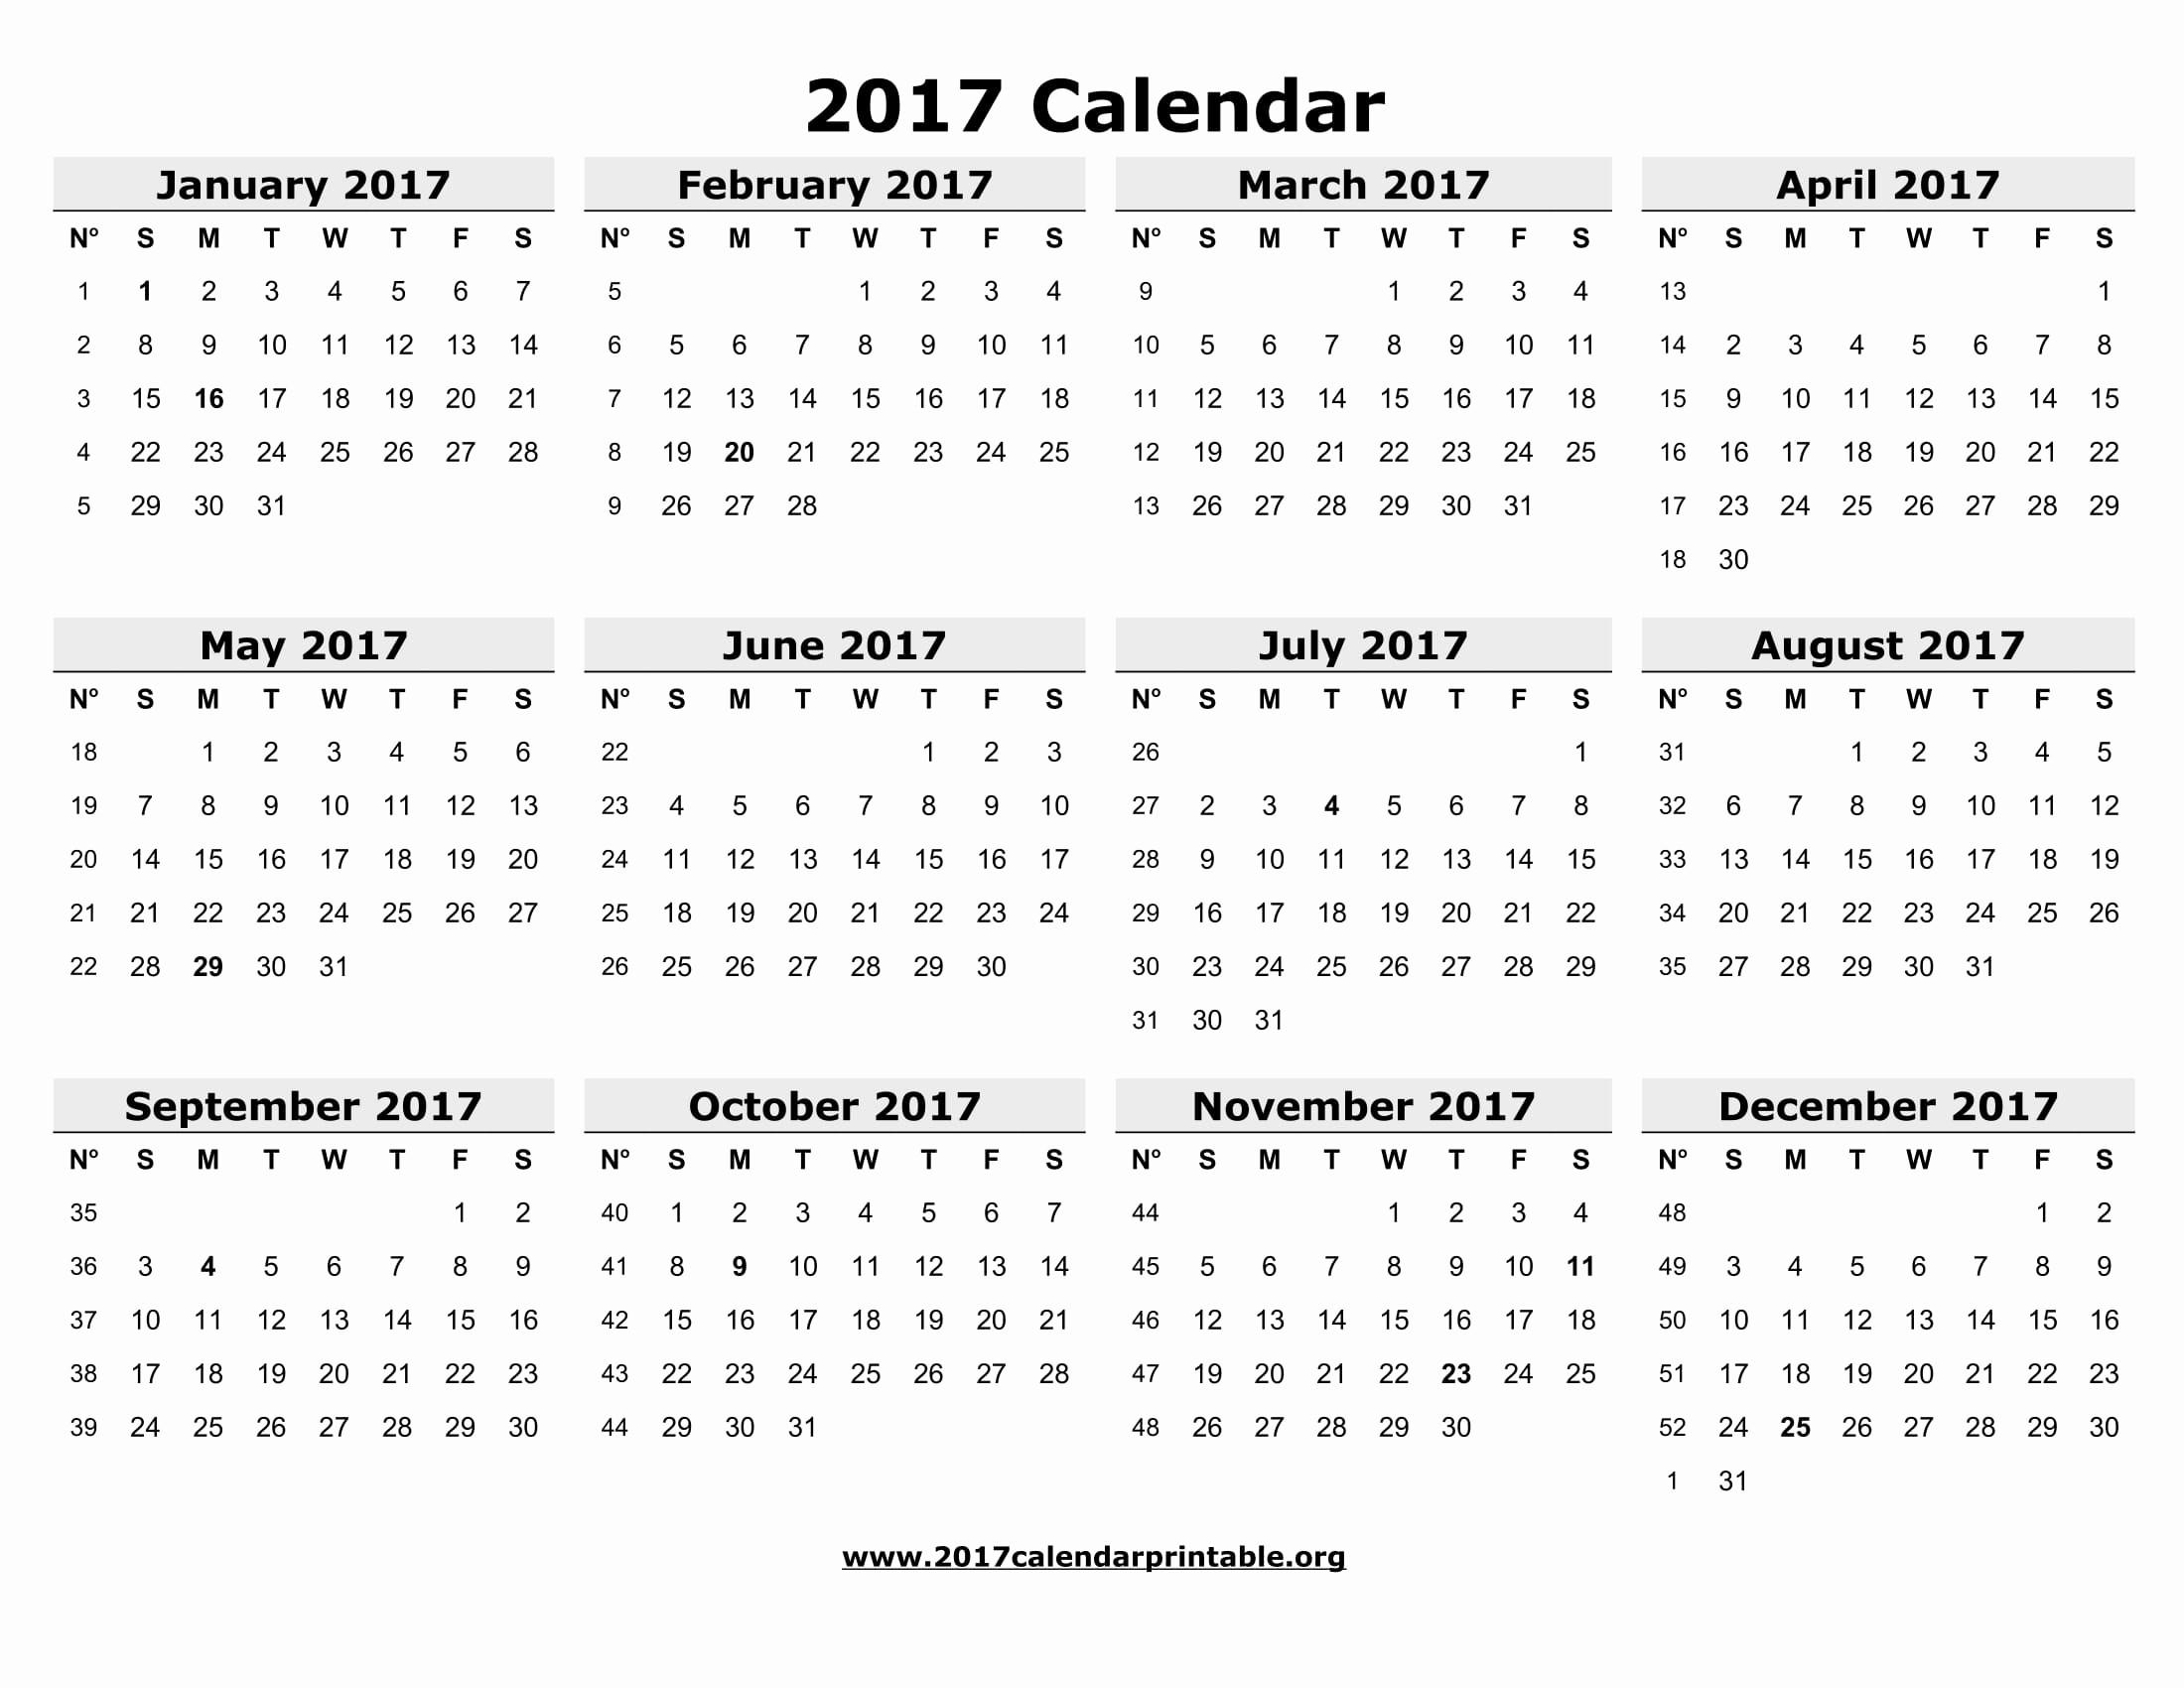 2017 Calendar Month by Month Fresh 12 Month Calendar 2017 Printable